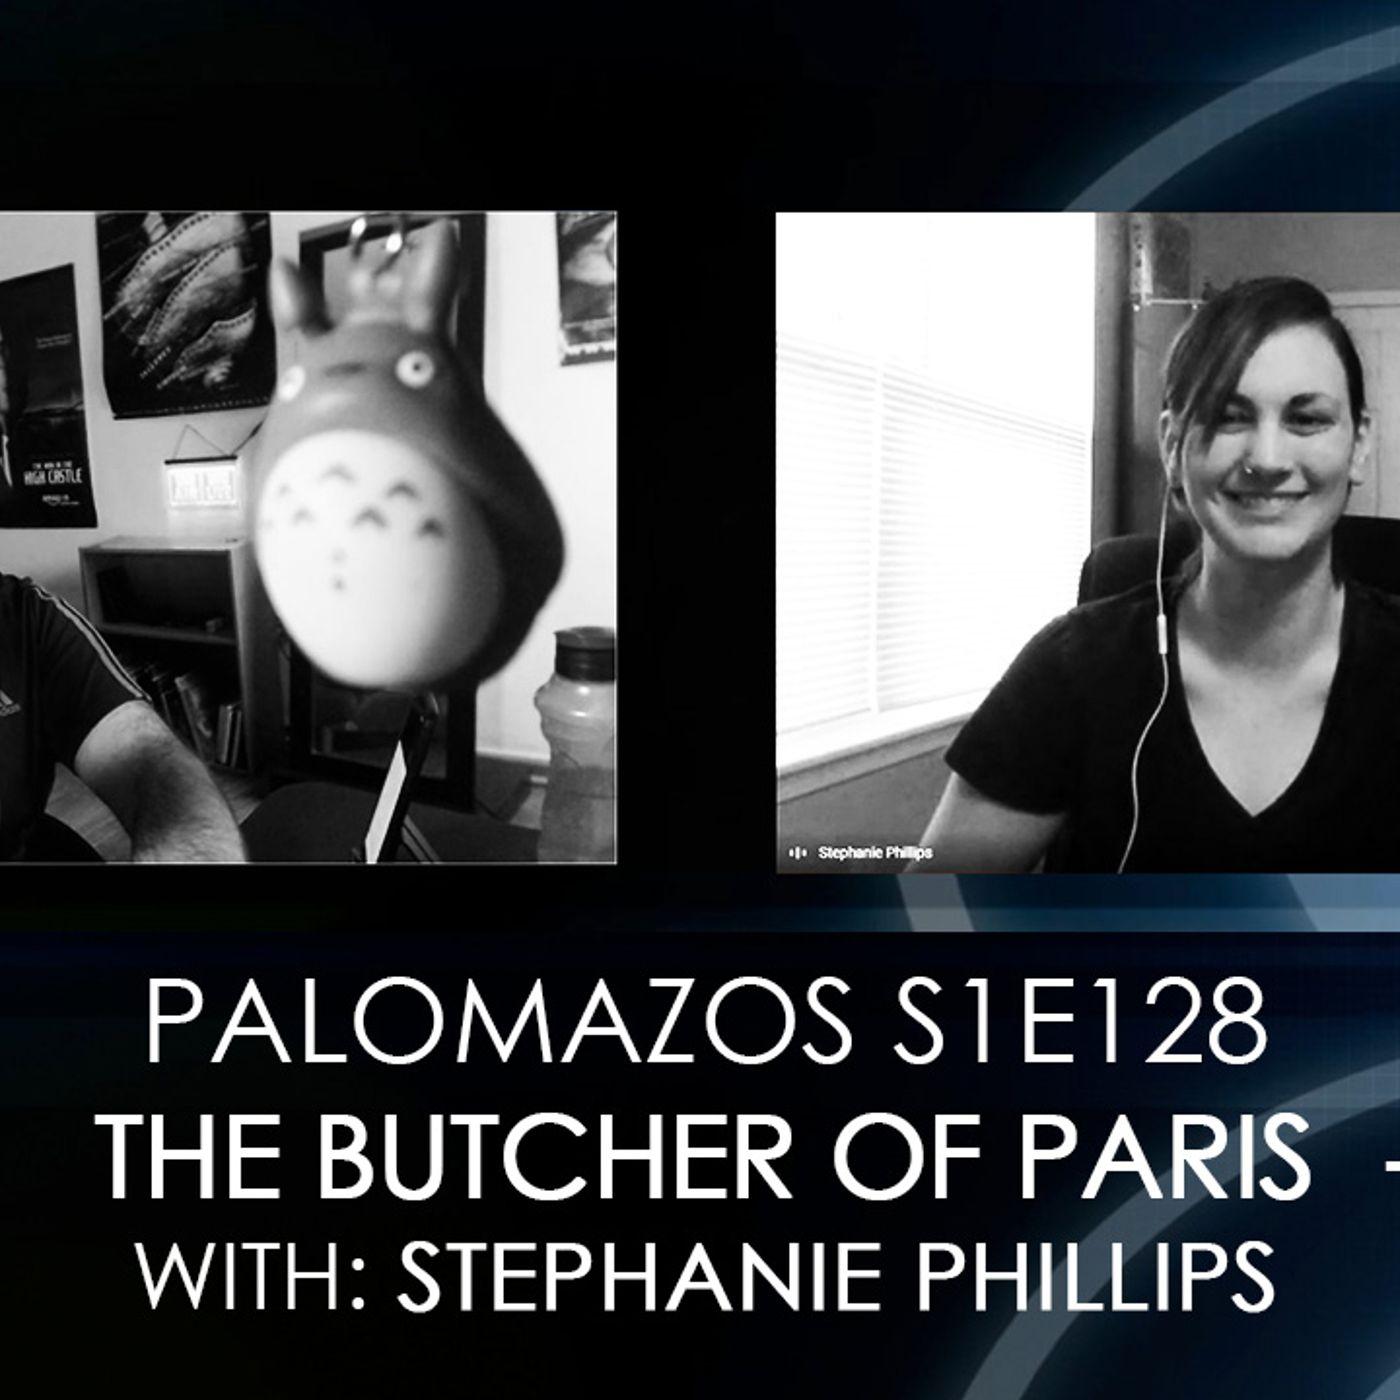 Palomazos S1E128 - The Butcher of Paris (with Stephanie Phillips)